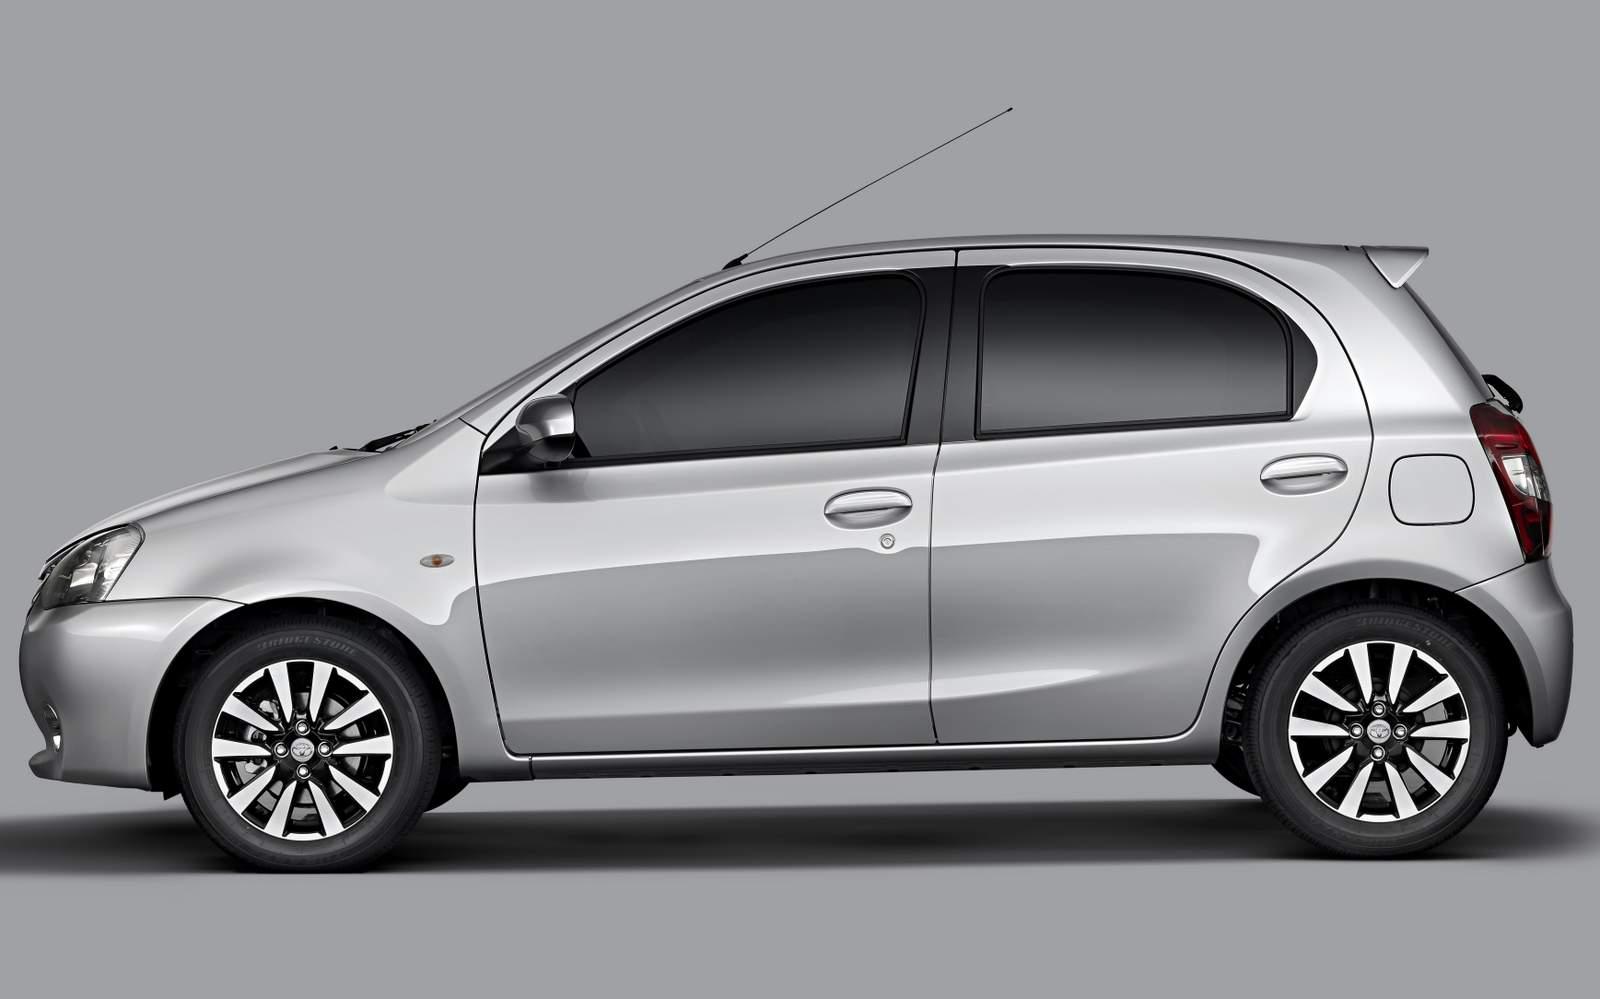 Toyota Etios 2018 2019 2020 New Car Release Date 2002 Tahoe Power Seat Wiring Diagram 2014 Platinum Preo Parte De R 47090